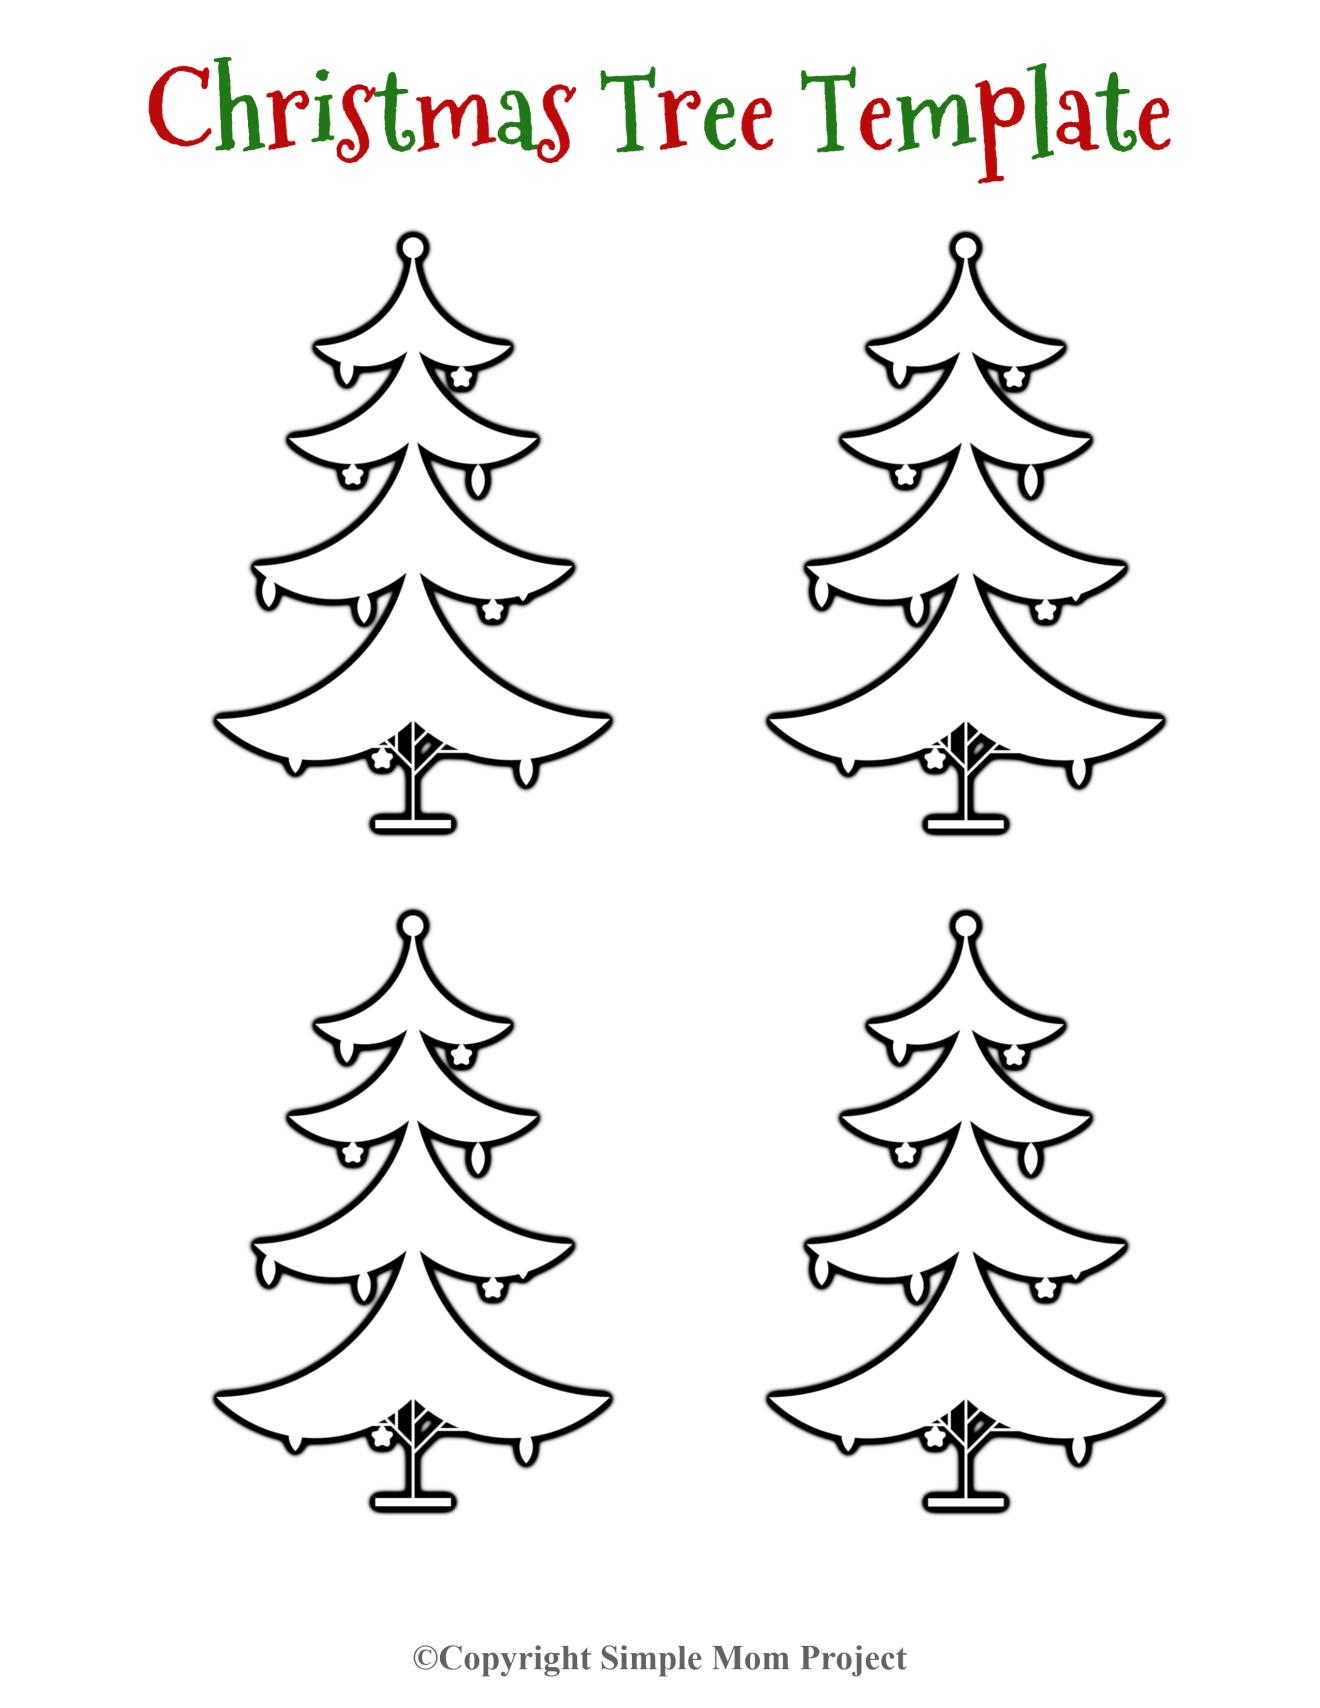 Free Printable Small Snowflake Templates Christmas Tree Template Diy Christmas Tags Diy Christmas Cards